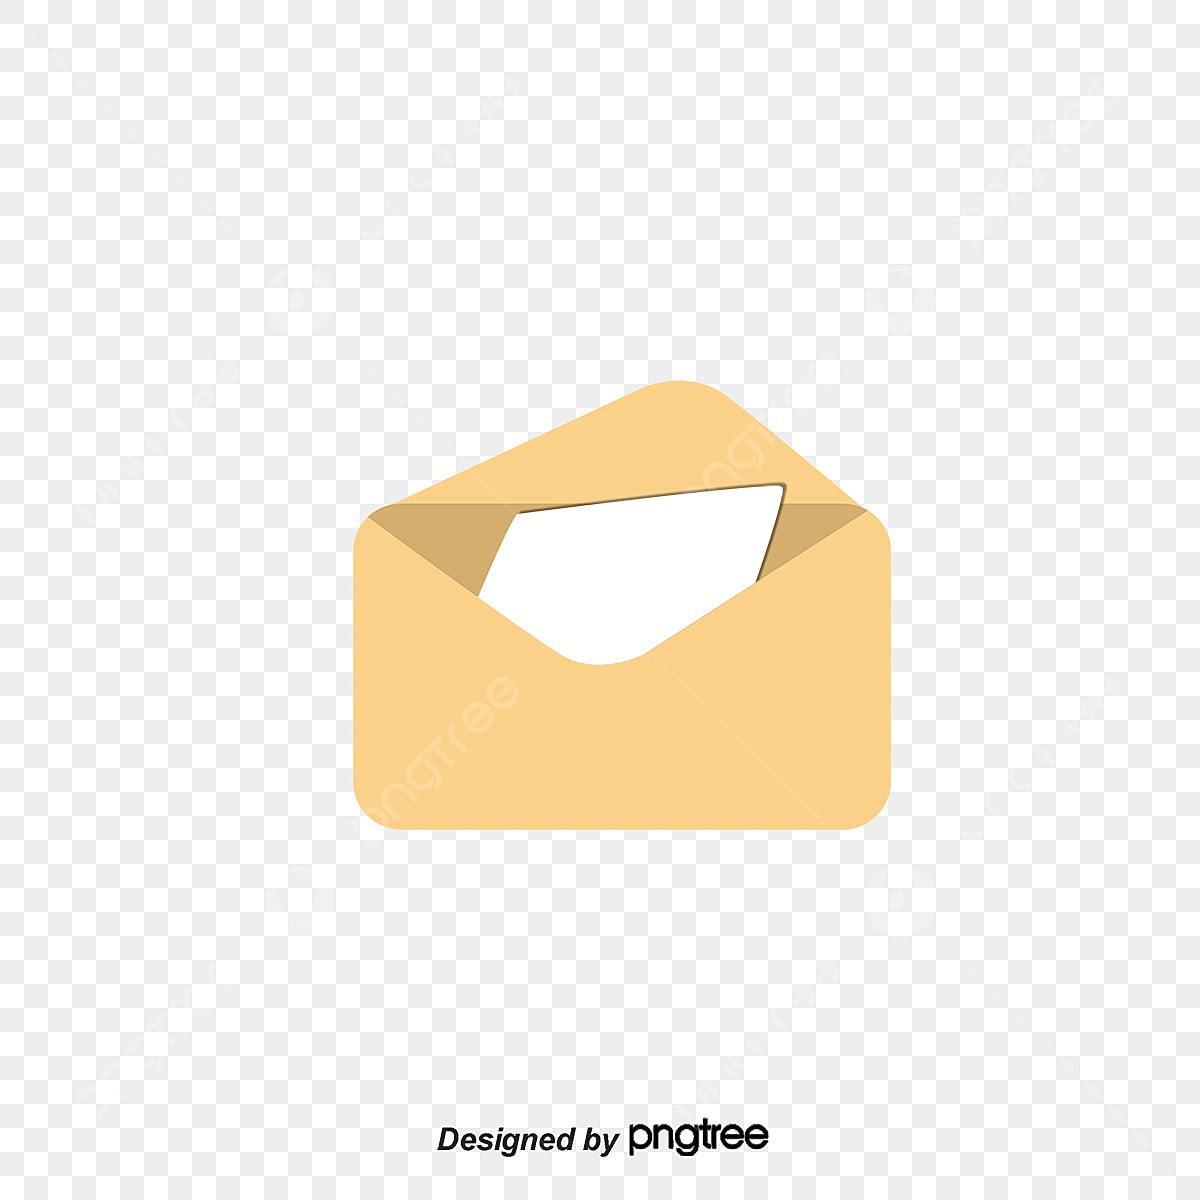 Buka Amplop Amplop Kuning Surat Png Dan Vektor Untuk Muat